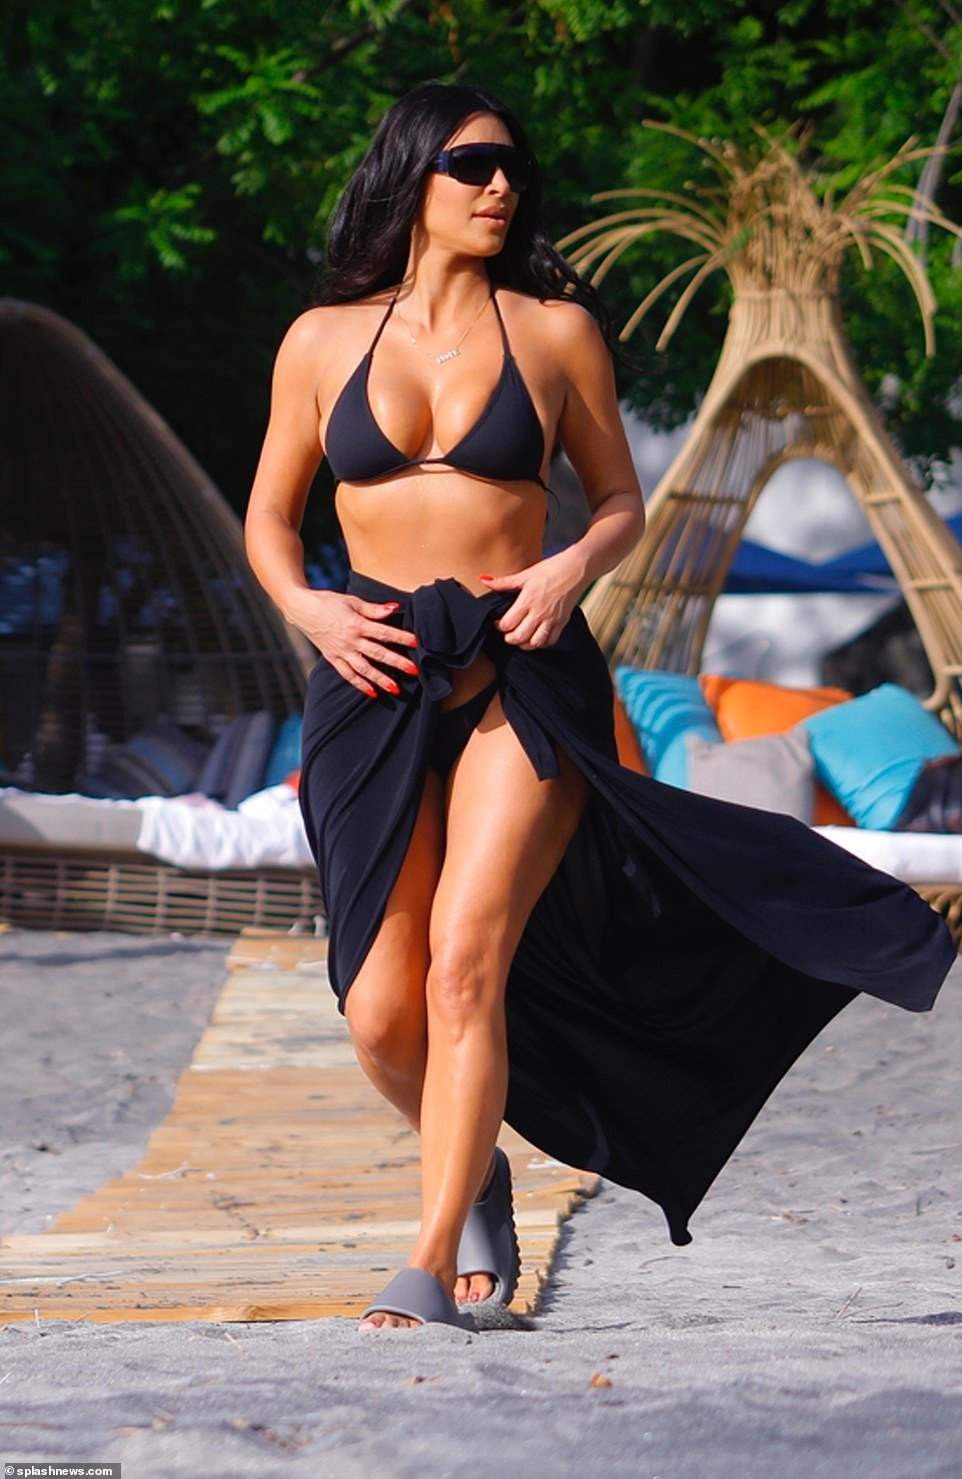 Kim Kardashian Showcases Her Killer Curves In Tiny Bikini (Photos)